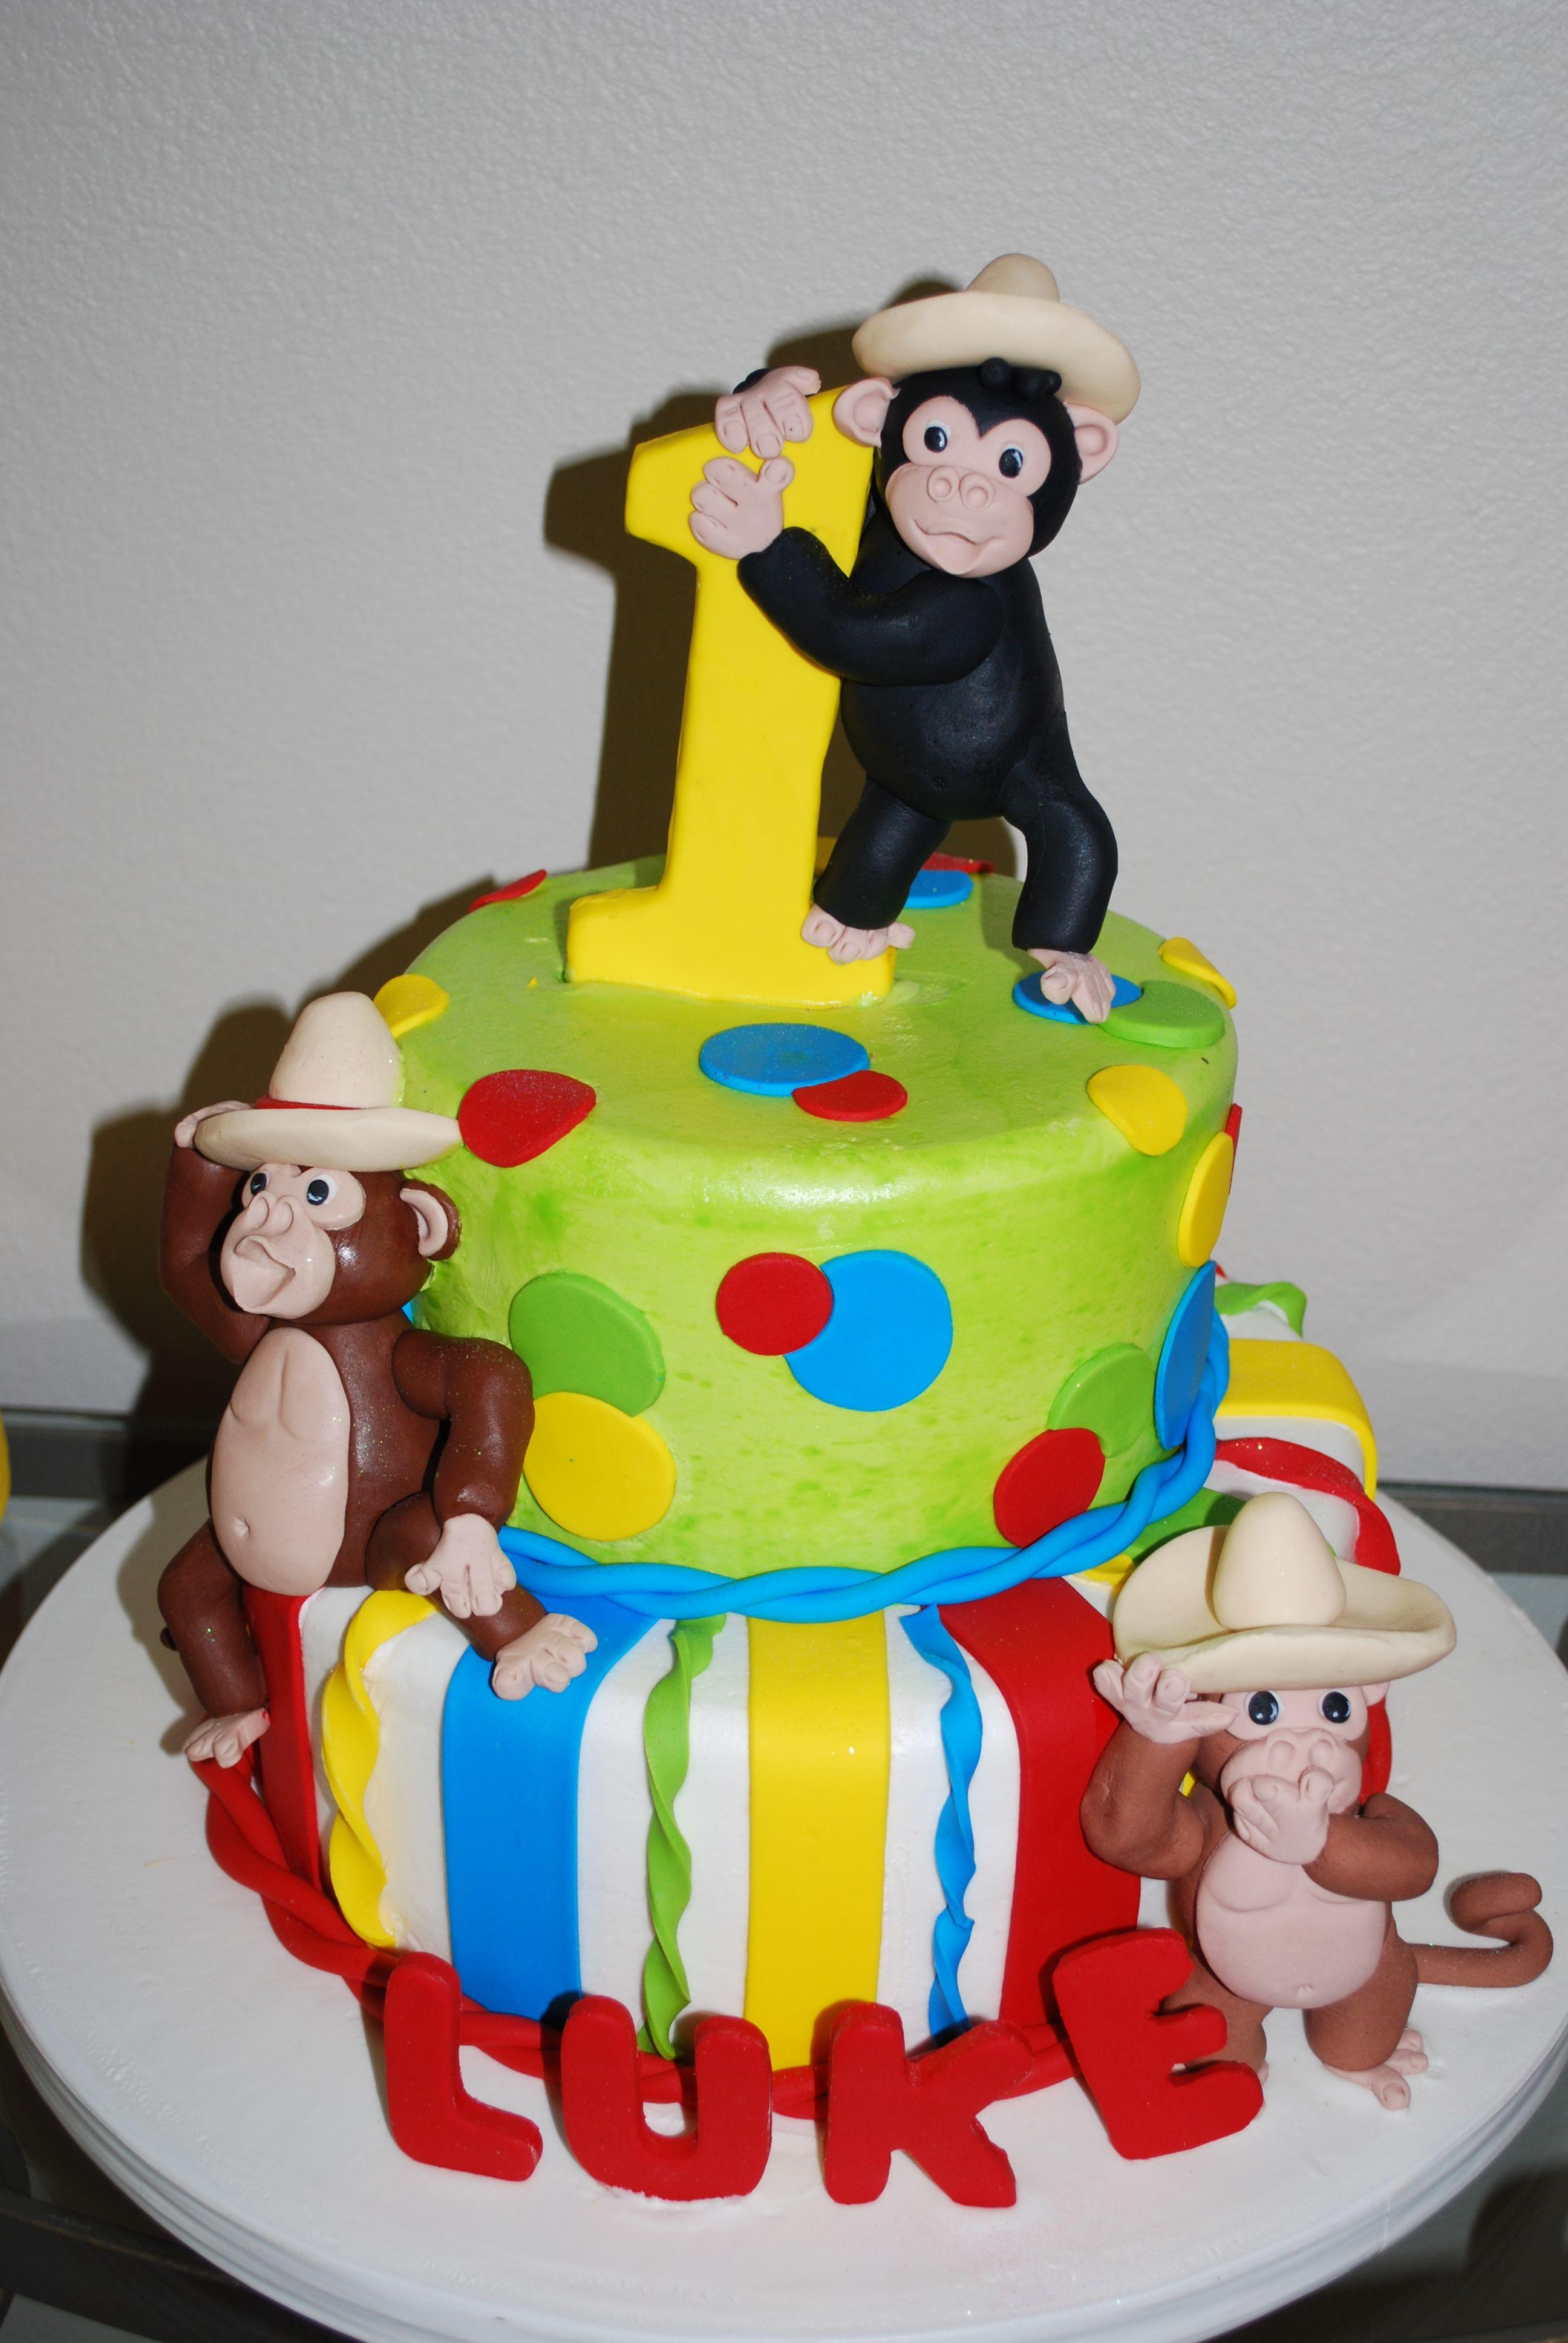 Lukes Birthday Cake from Cinderella Cakes Orange County CA